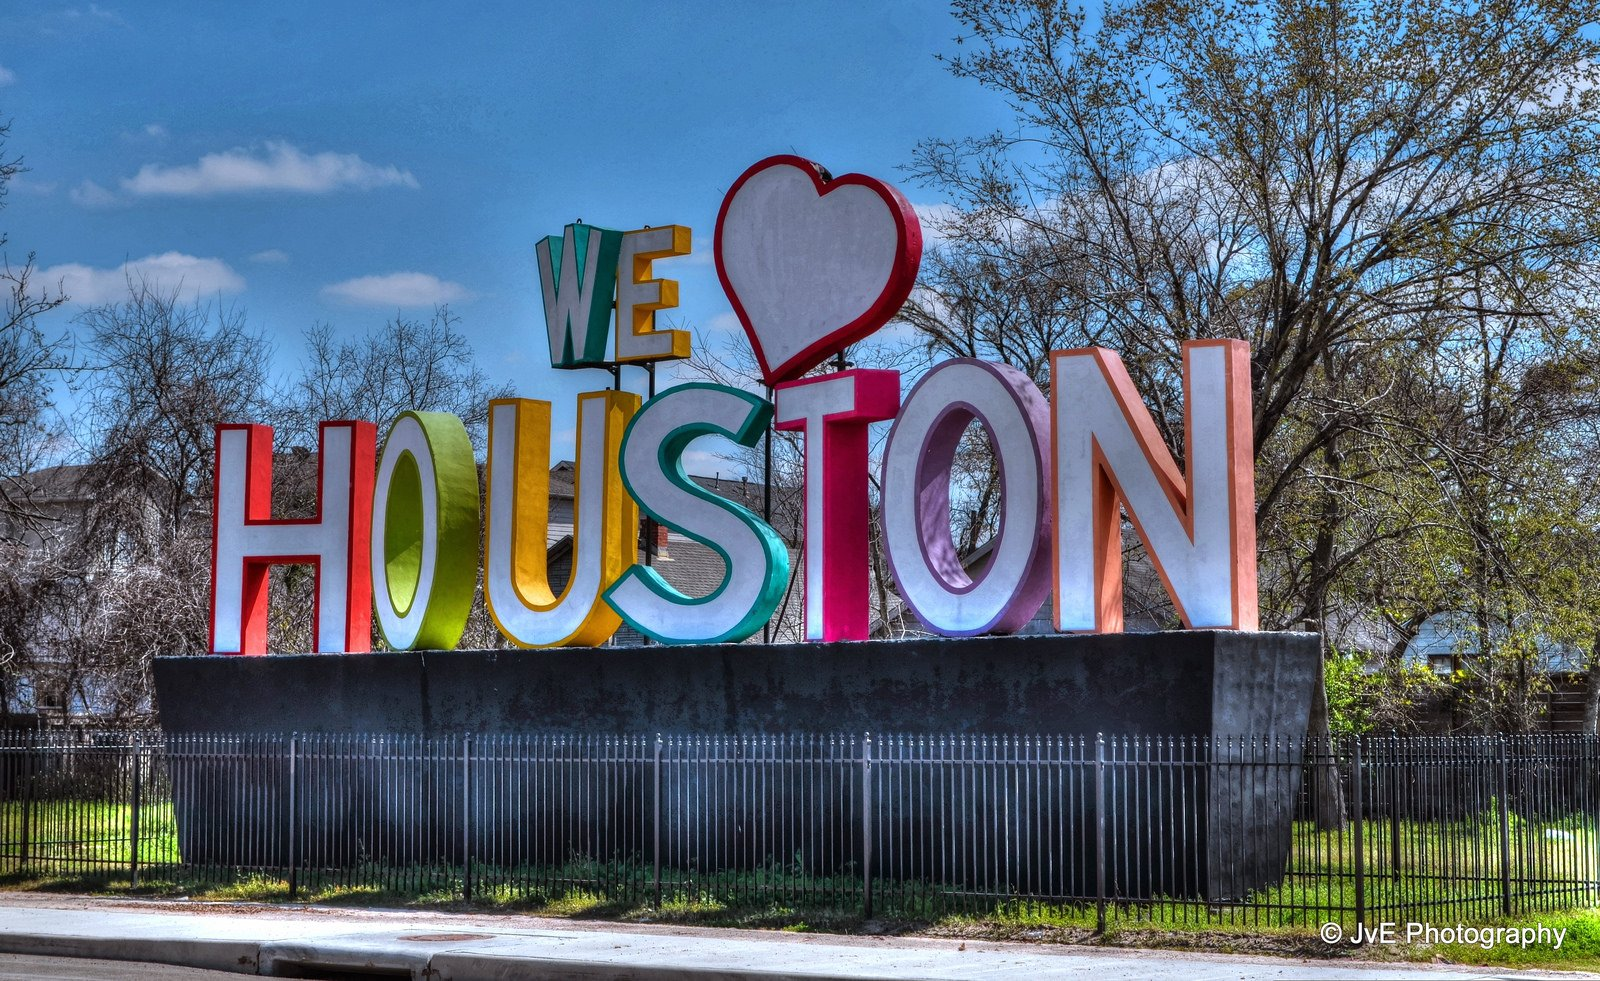 Houston architecture bridges cities City texas Night towers buildings 1600x981